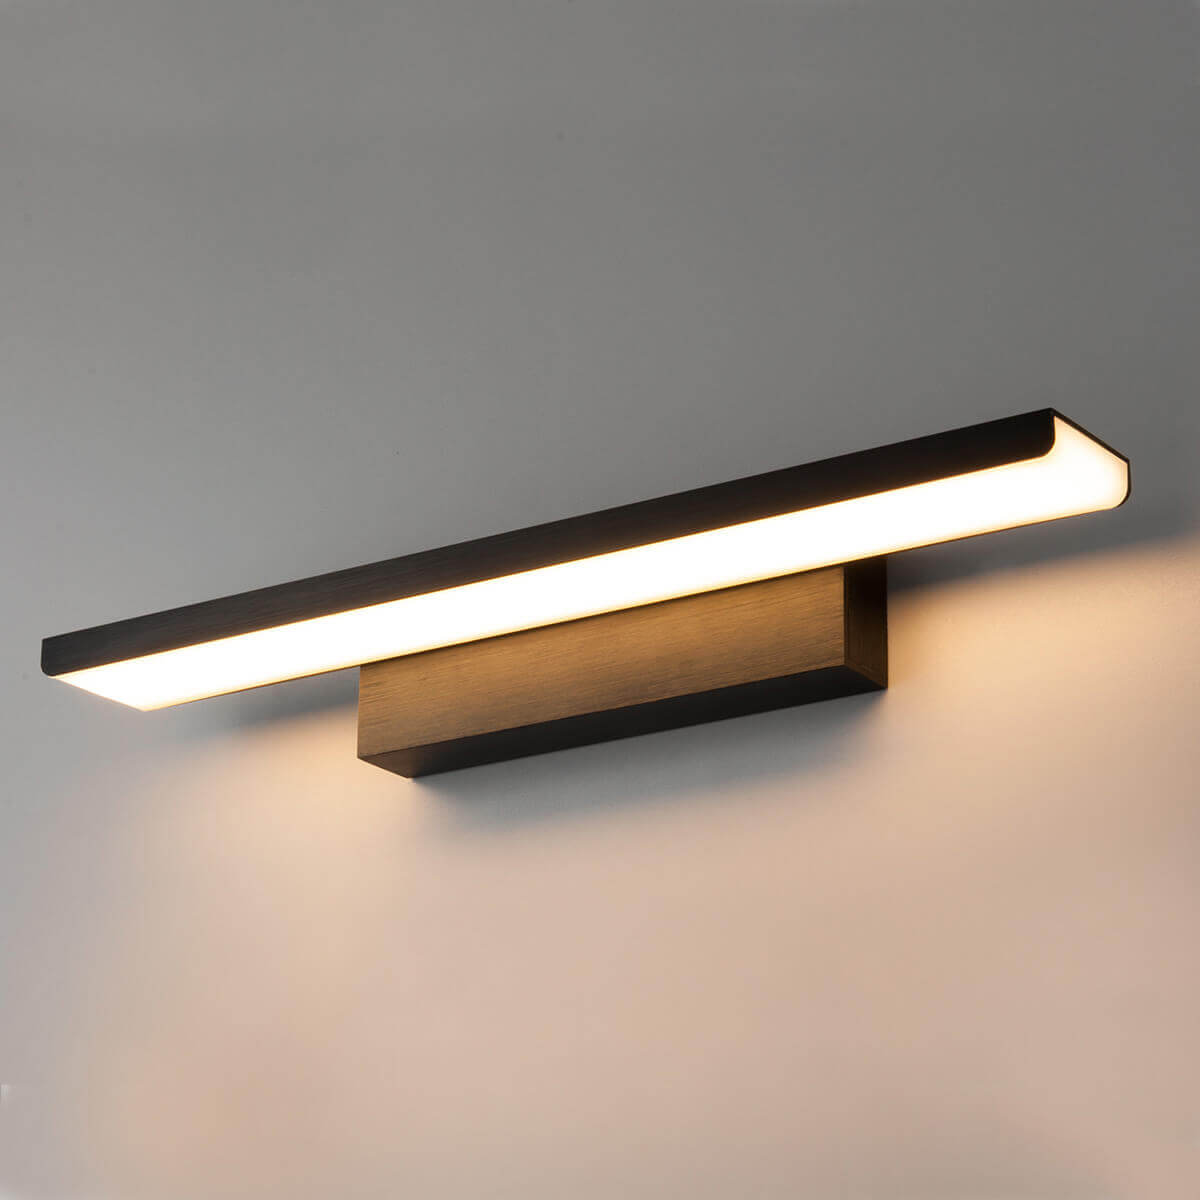 Подсветка для картин Elektrostandard Sankara LED 16W 1009 IP20 черная 4690389102790 цена и фото